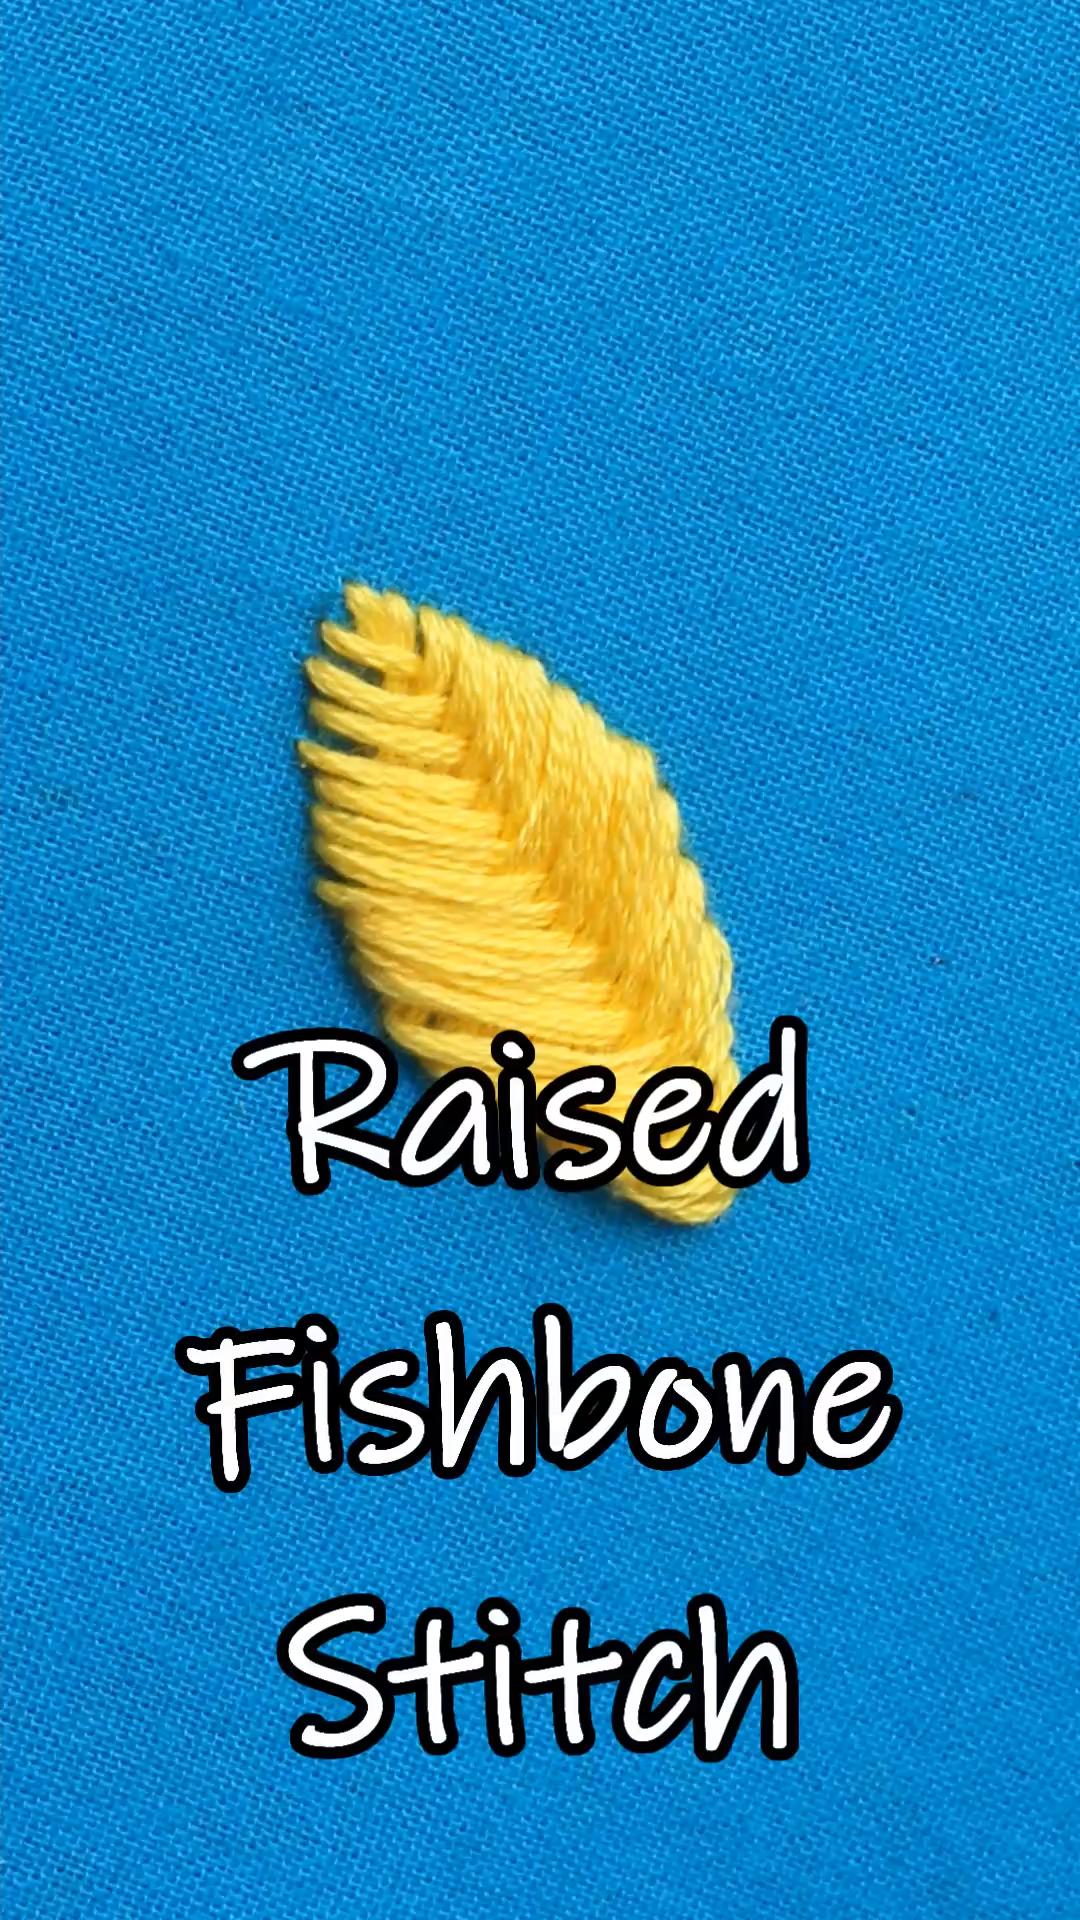 Raised Fishbone Stitch #embroidery